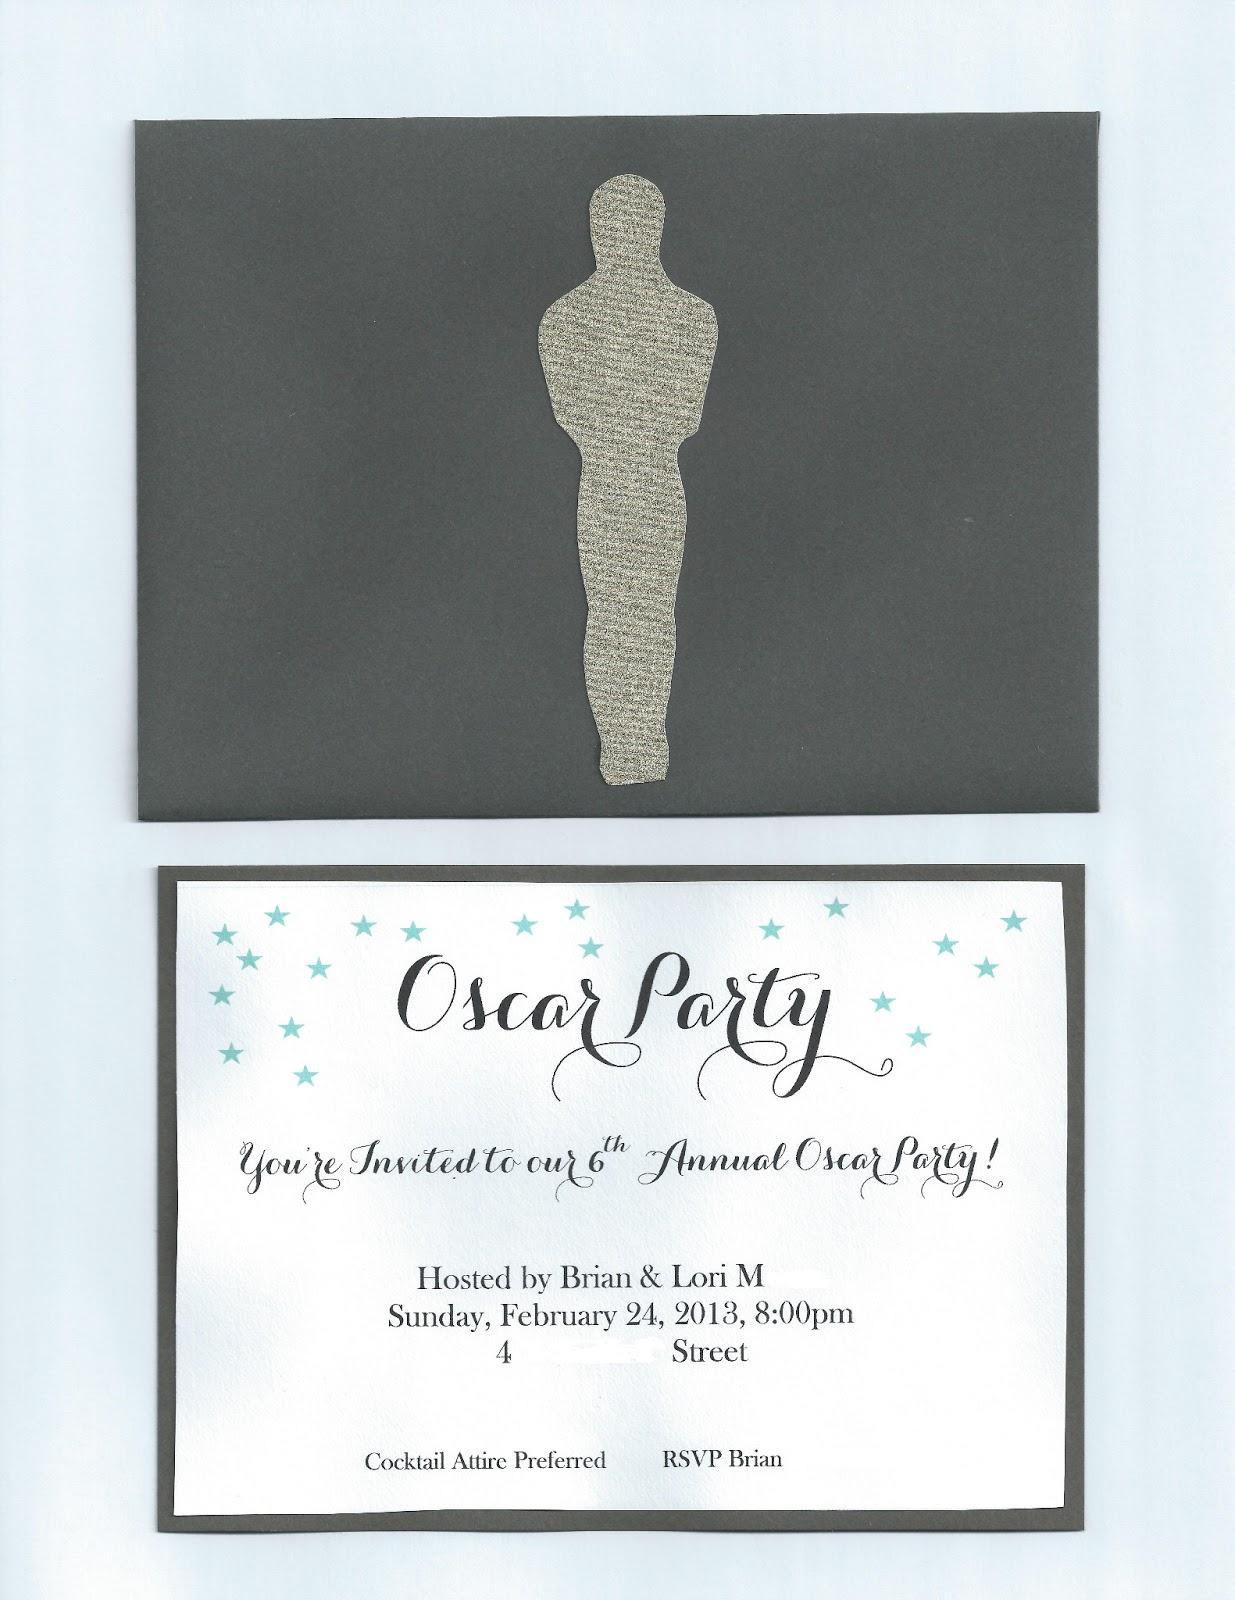 Just Nesting Oscar Party Invitation – Oscar Party Invitations